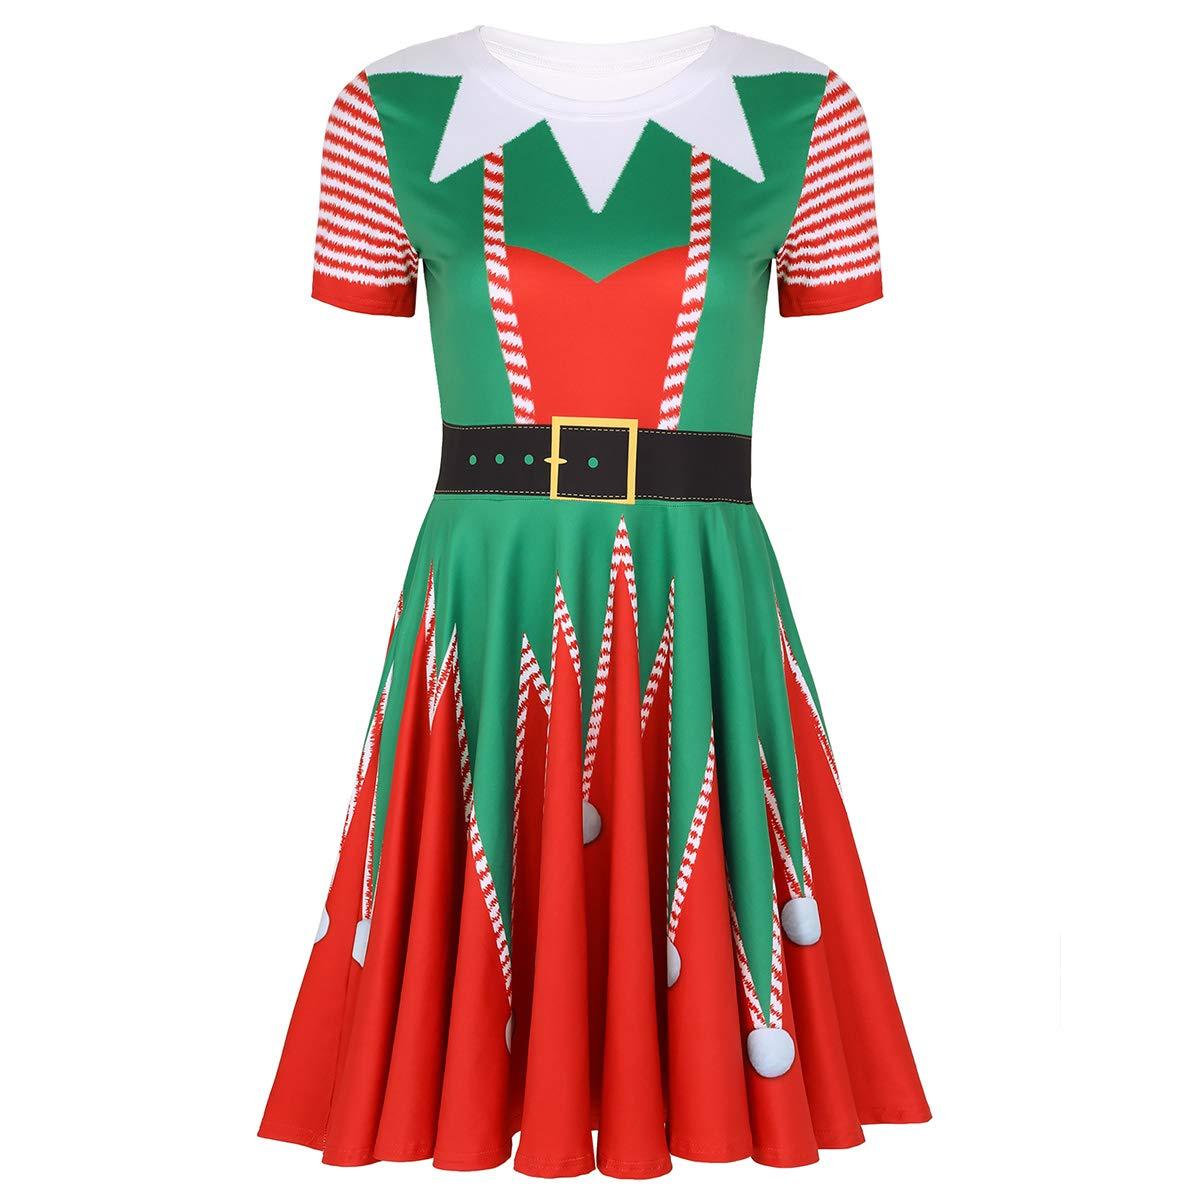 TiaoBug Femme D/éguisement Lutin No/ël Costume Elfe Robe M/ère No/ël Santa Imprim/é Robe /à Manche Courte Robe de F/ée No/ël Halloween F/ête Soir/ée S-XL